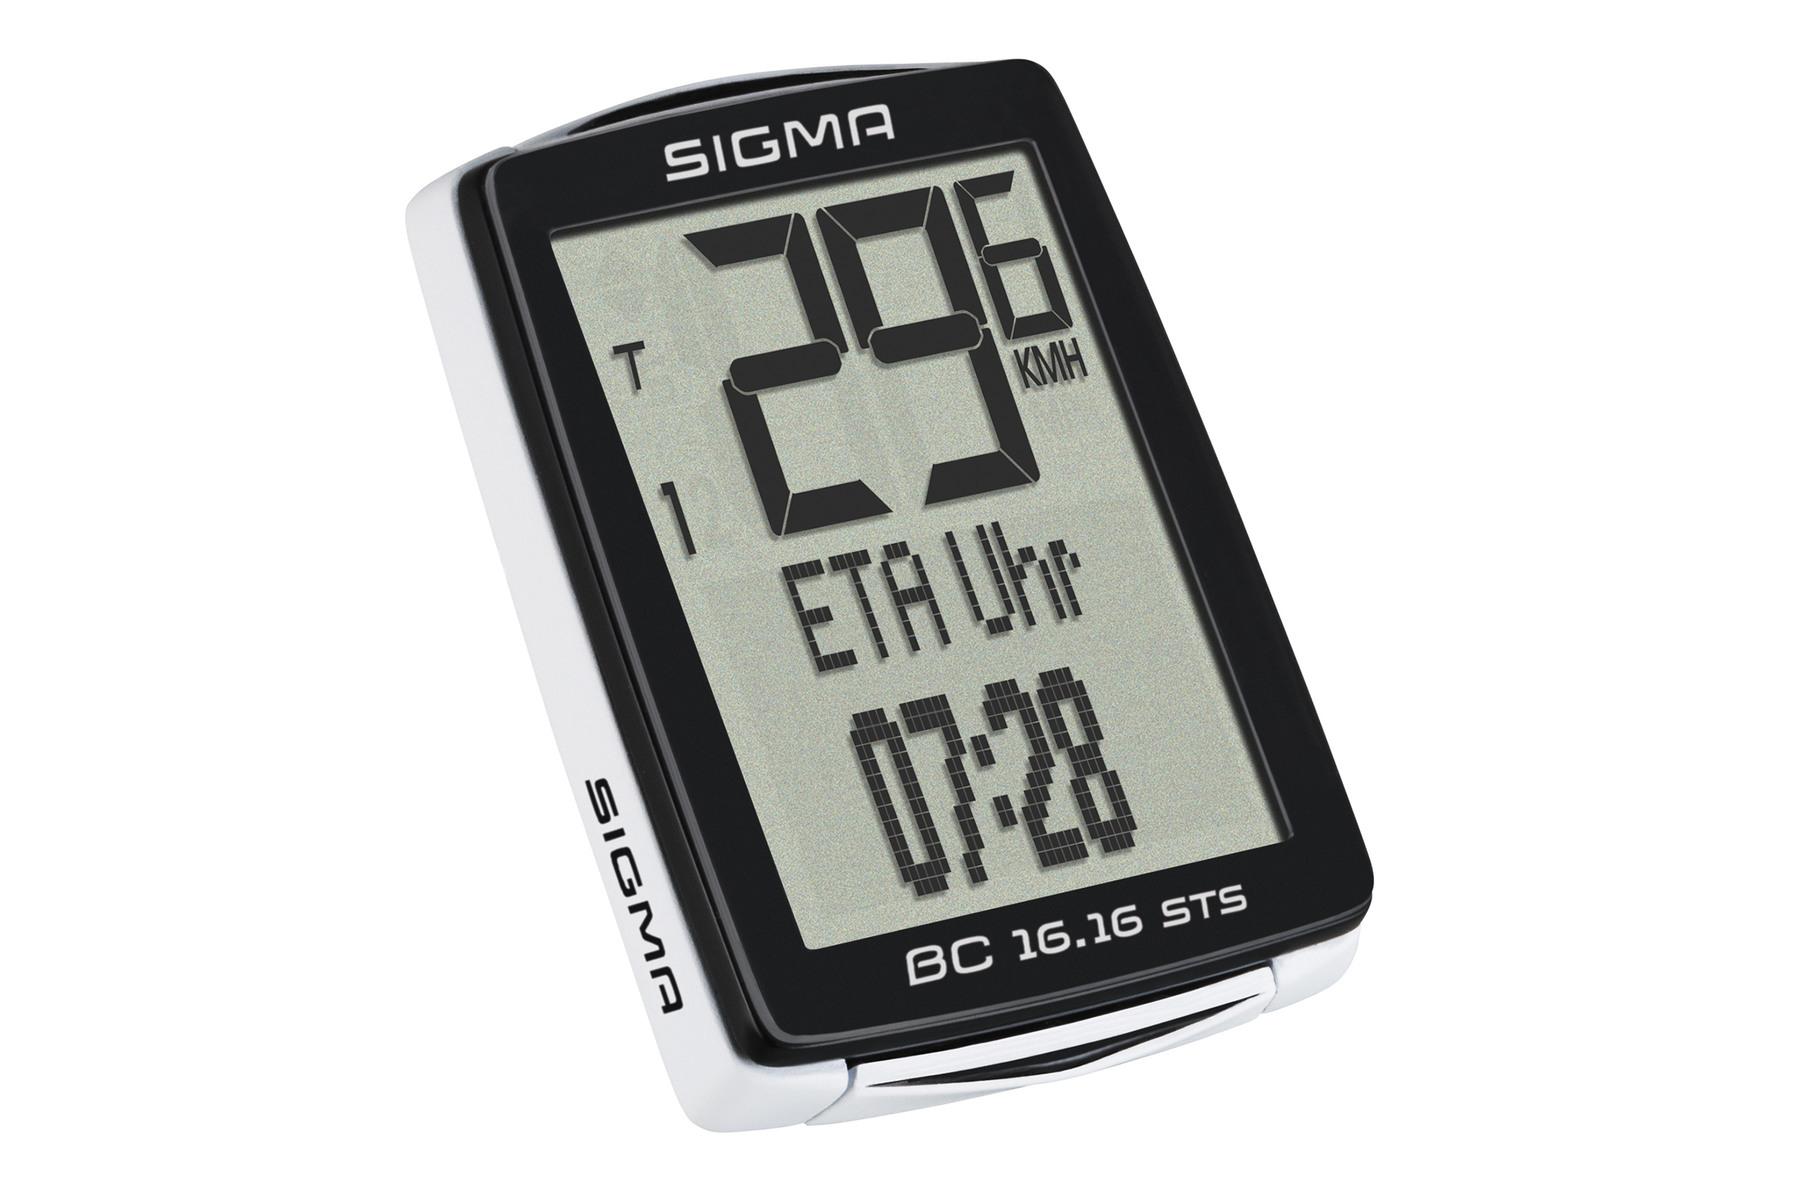 Sigma BC 16.16 STS CAD Fahrradcomputer -kabellos-